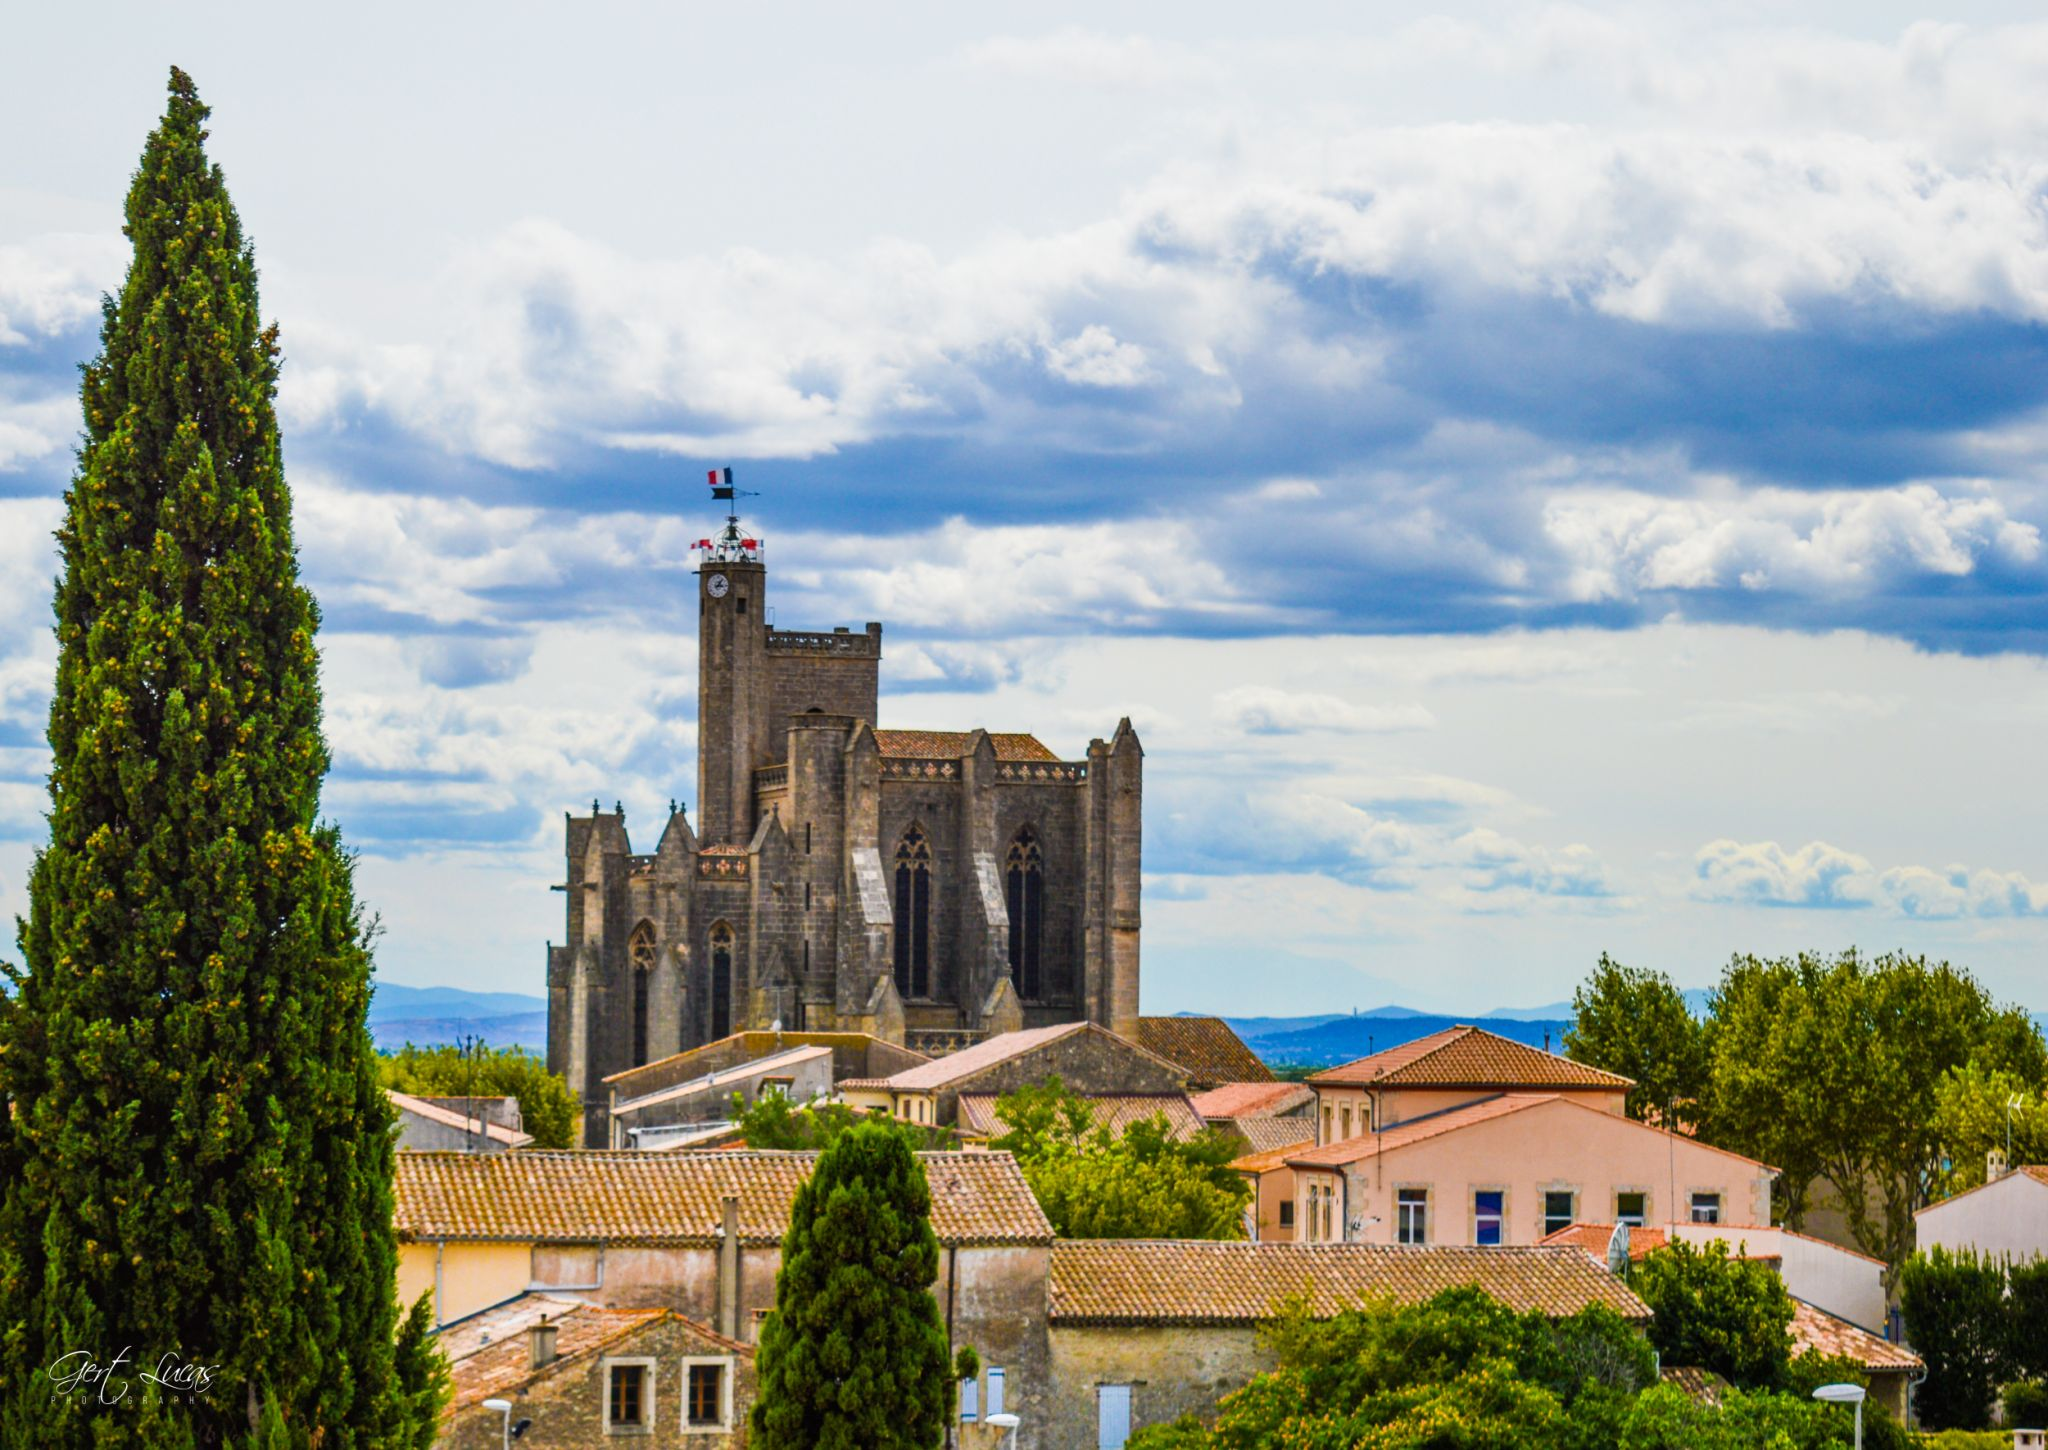 Capestang, France